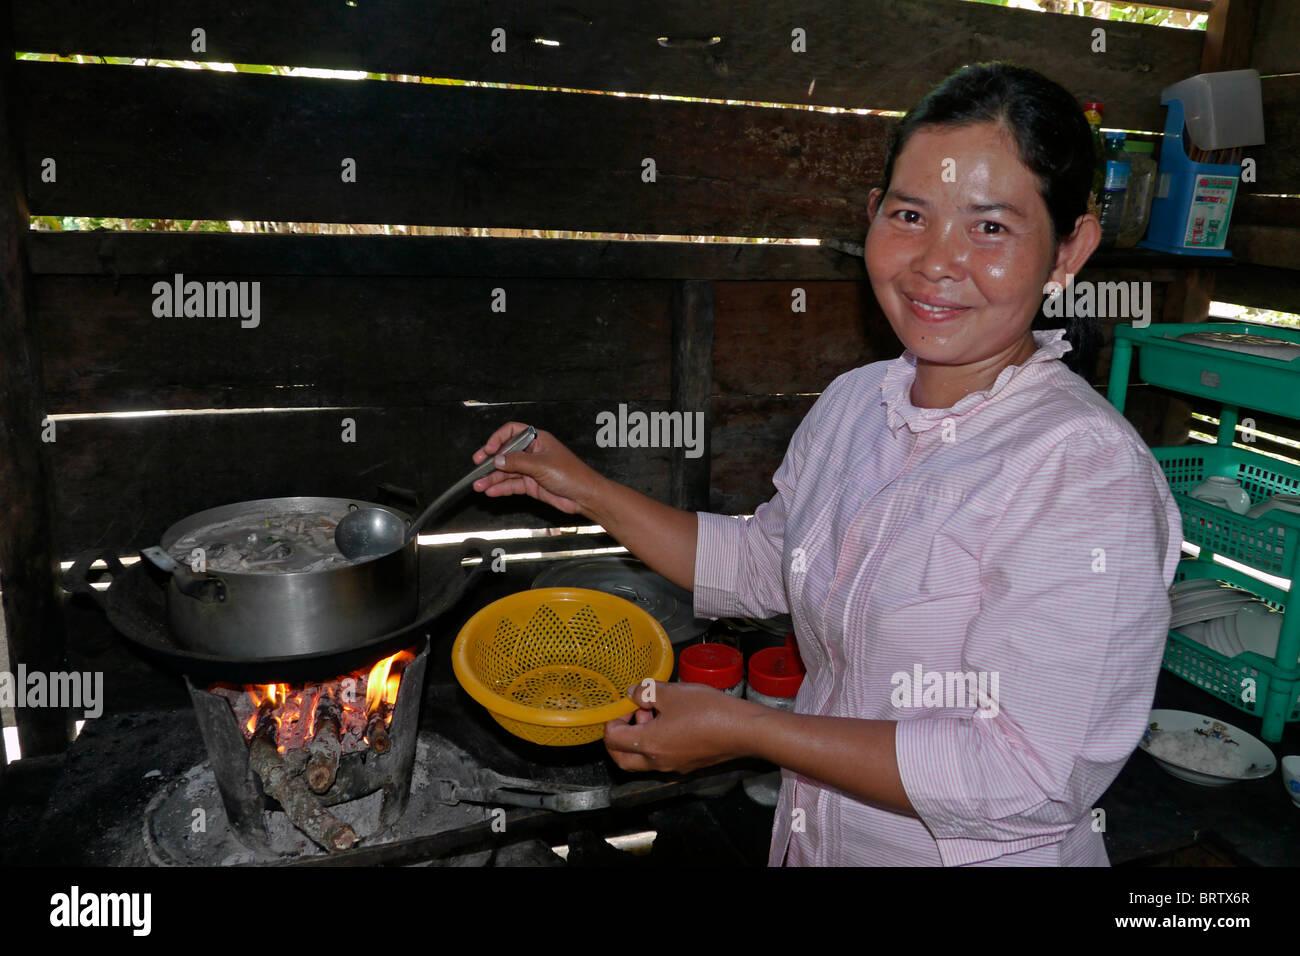 Порно камбоджа бесплатно фото 671-343